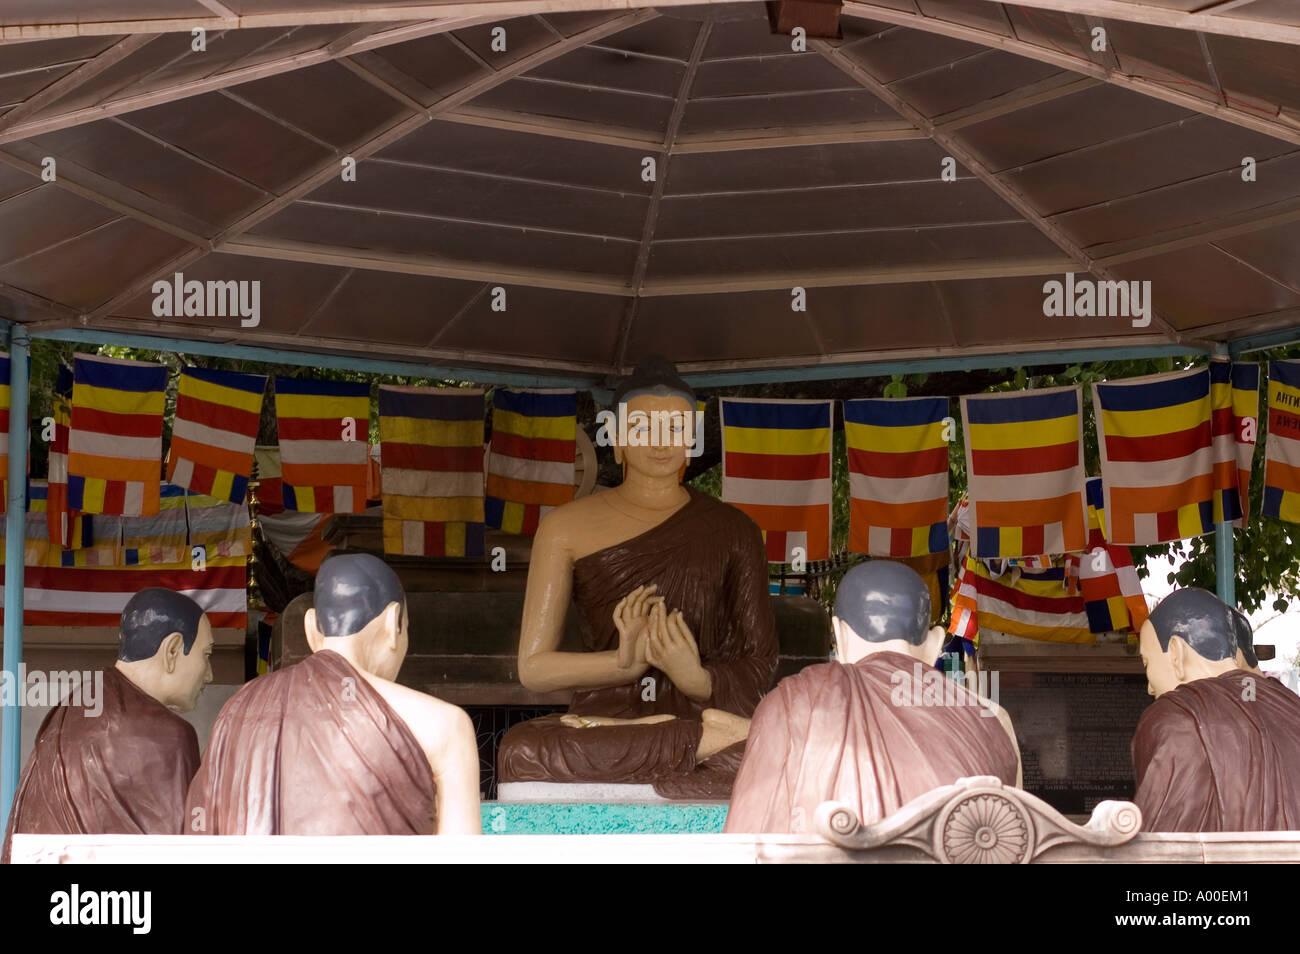 statues showing Buddha giving his first teachings in Sarnath Varanasi Bihar India - Stock Image